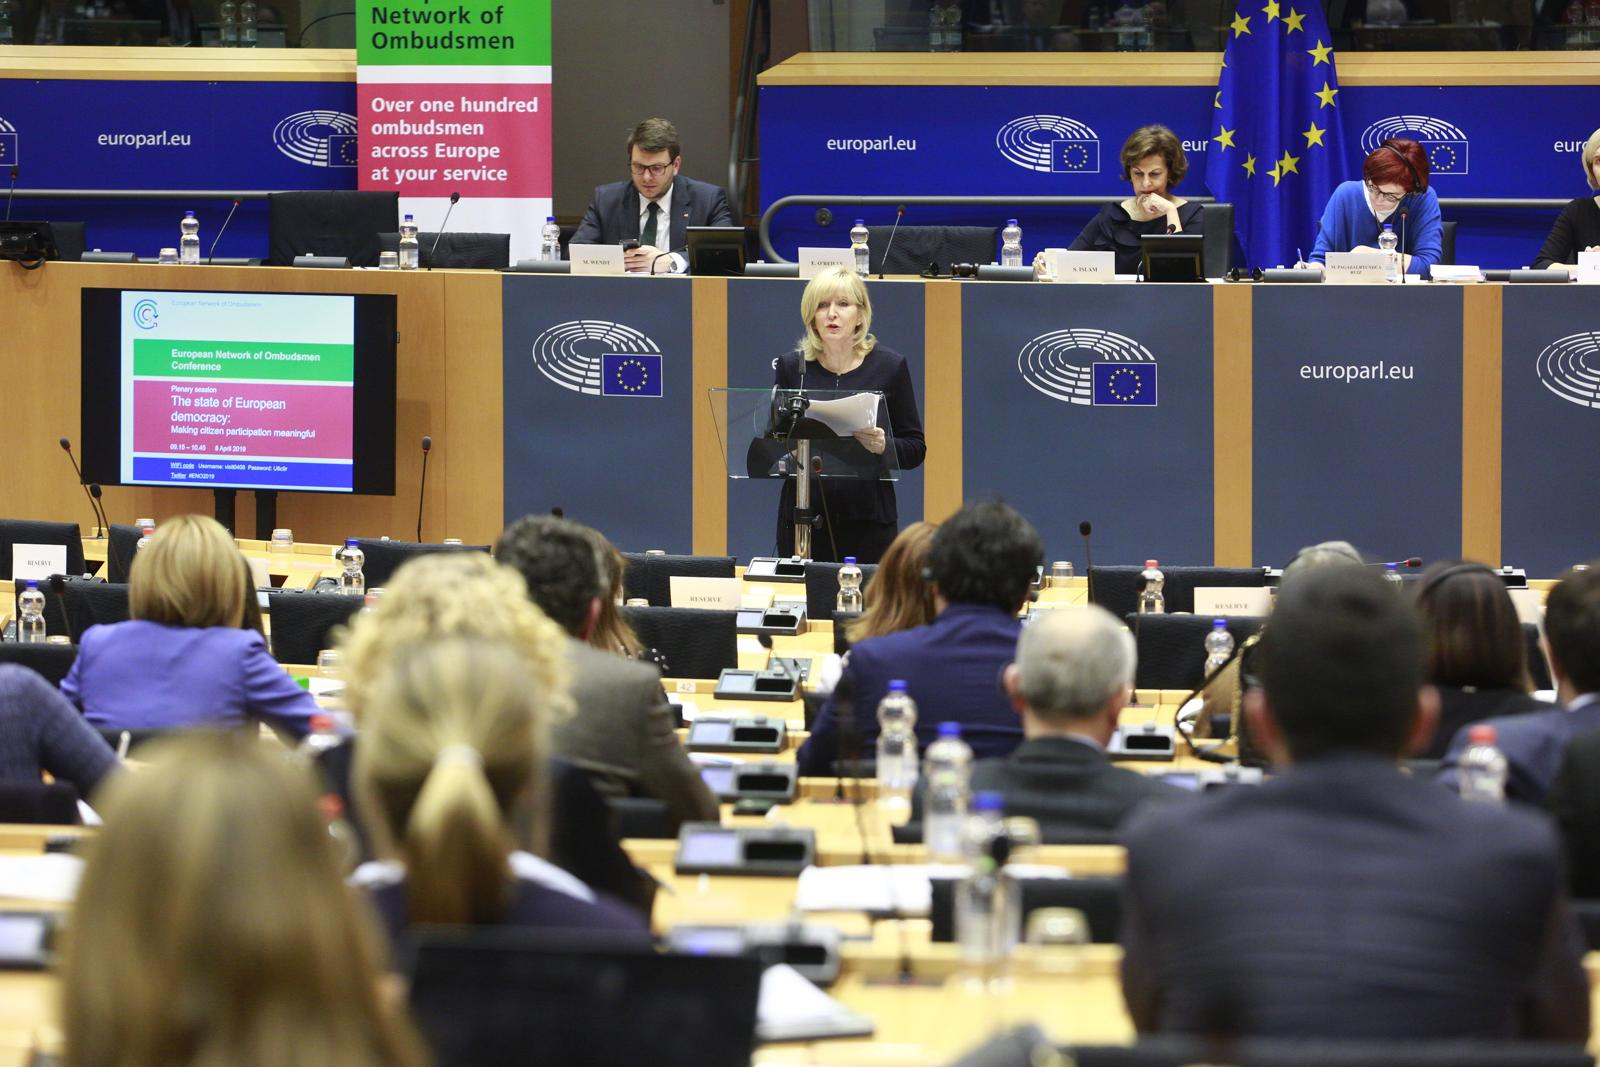 European Network of Ombudsmen Conference 2019